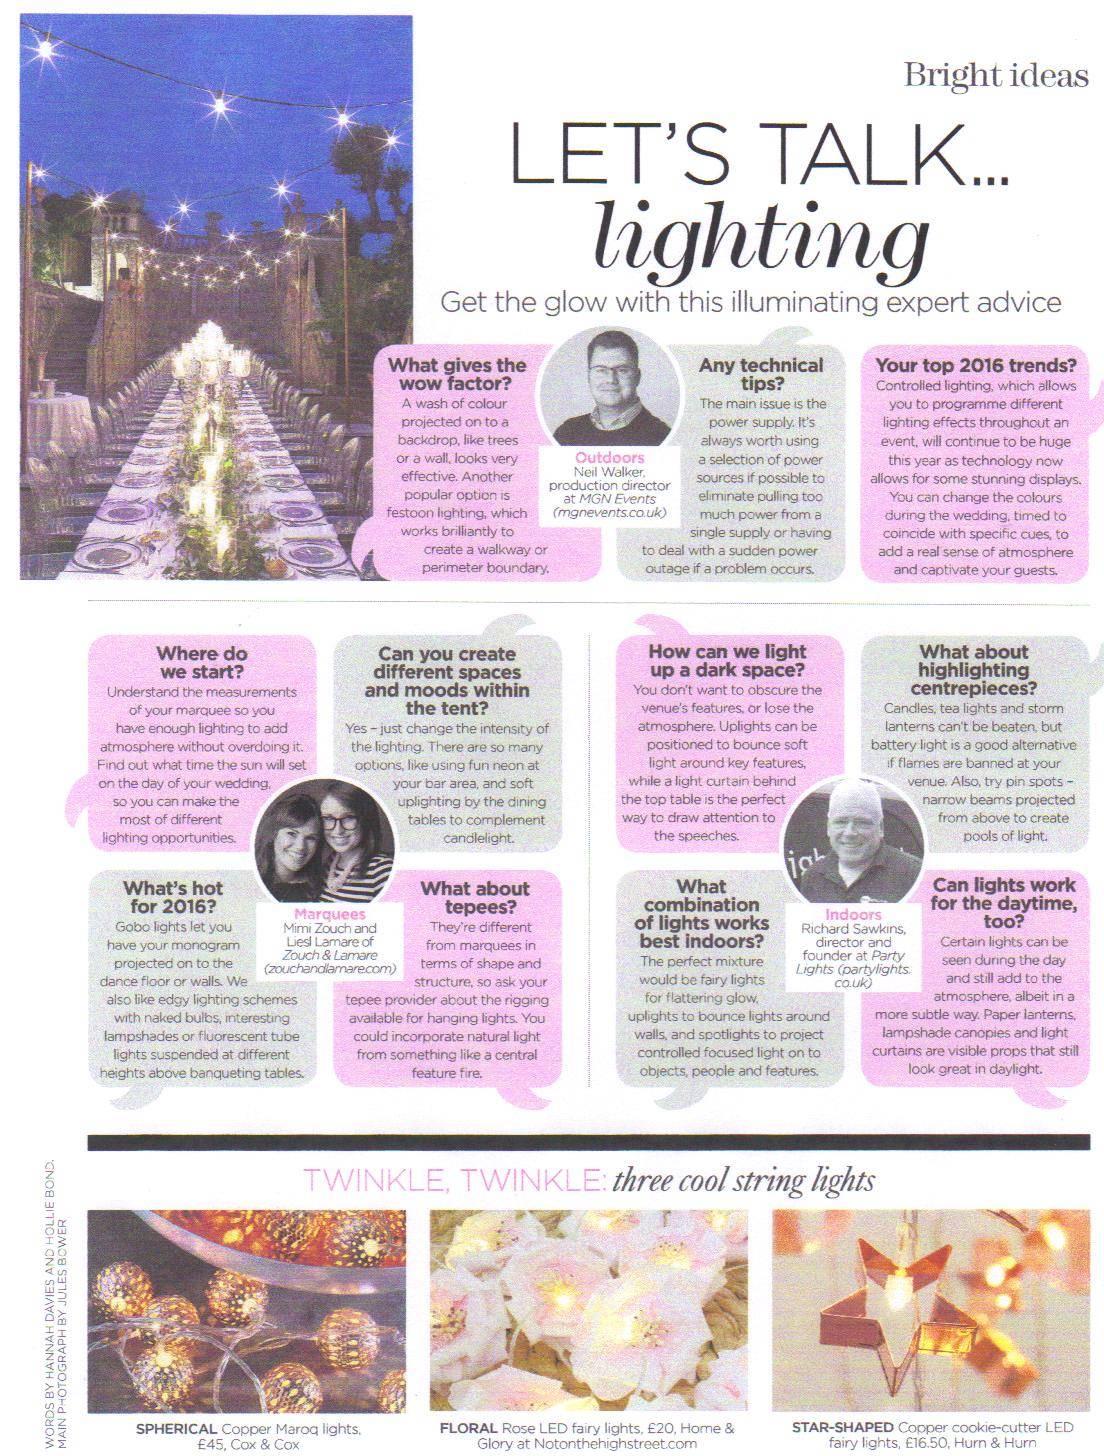 Lets talk lighting article April 16